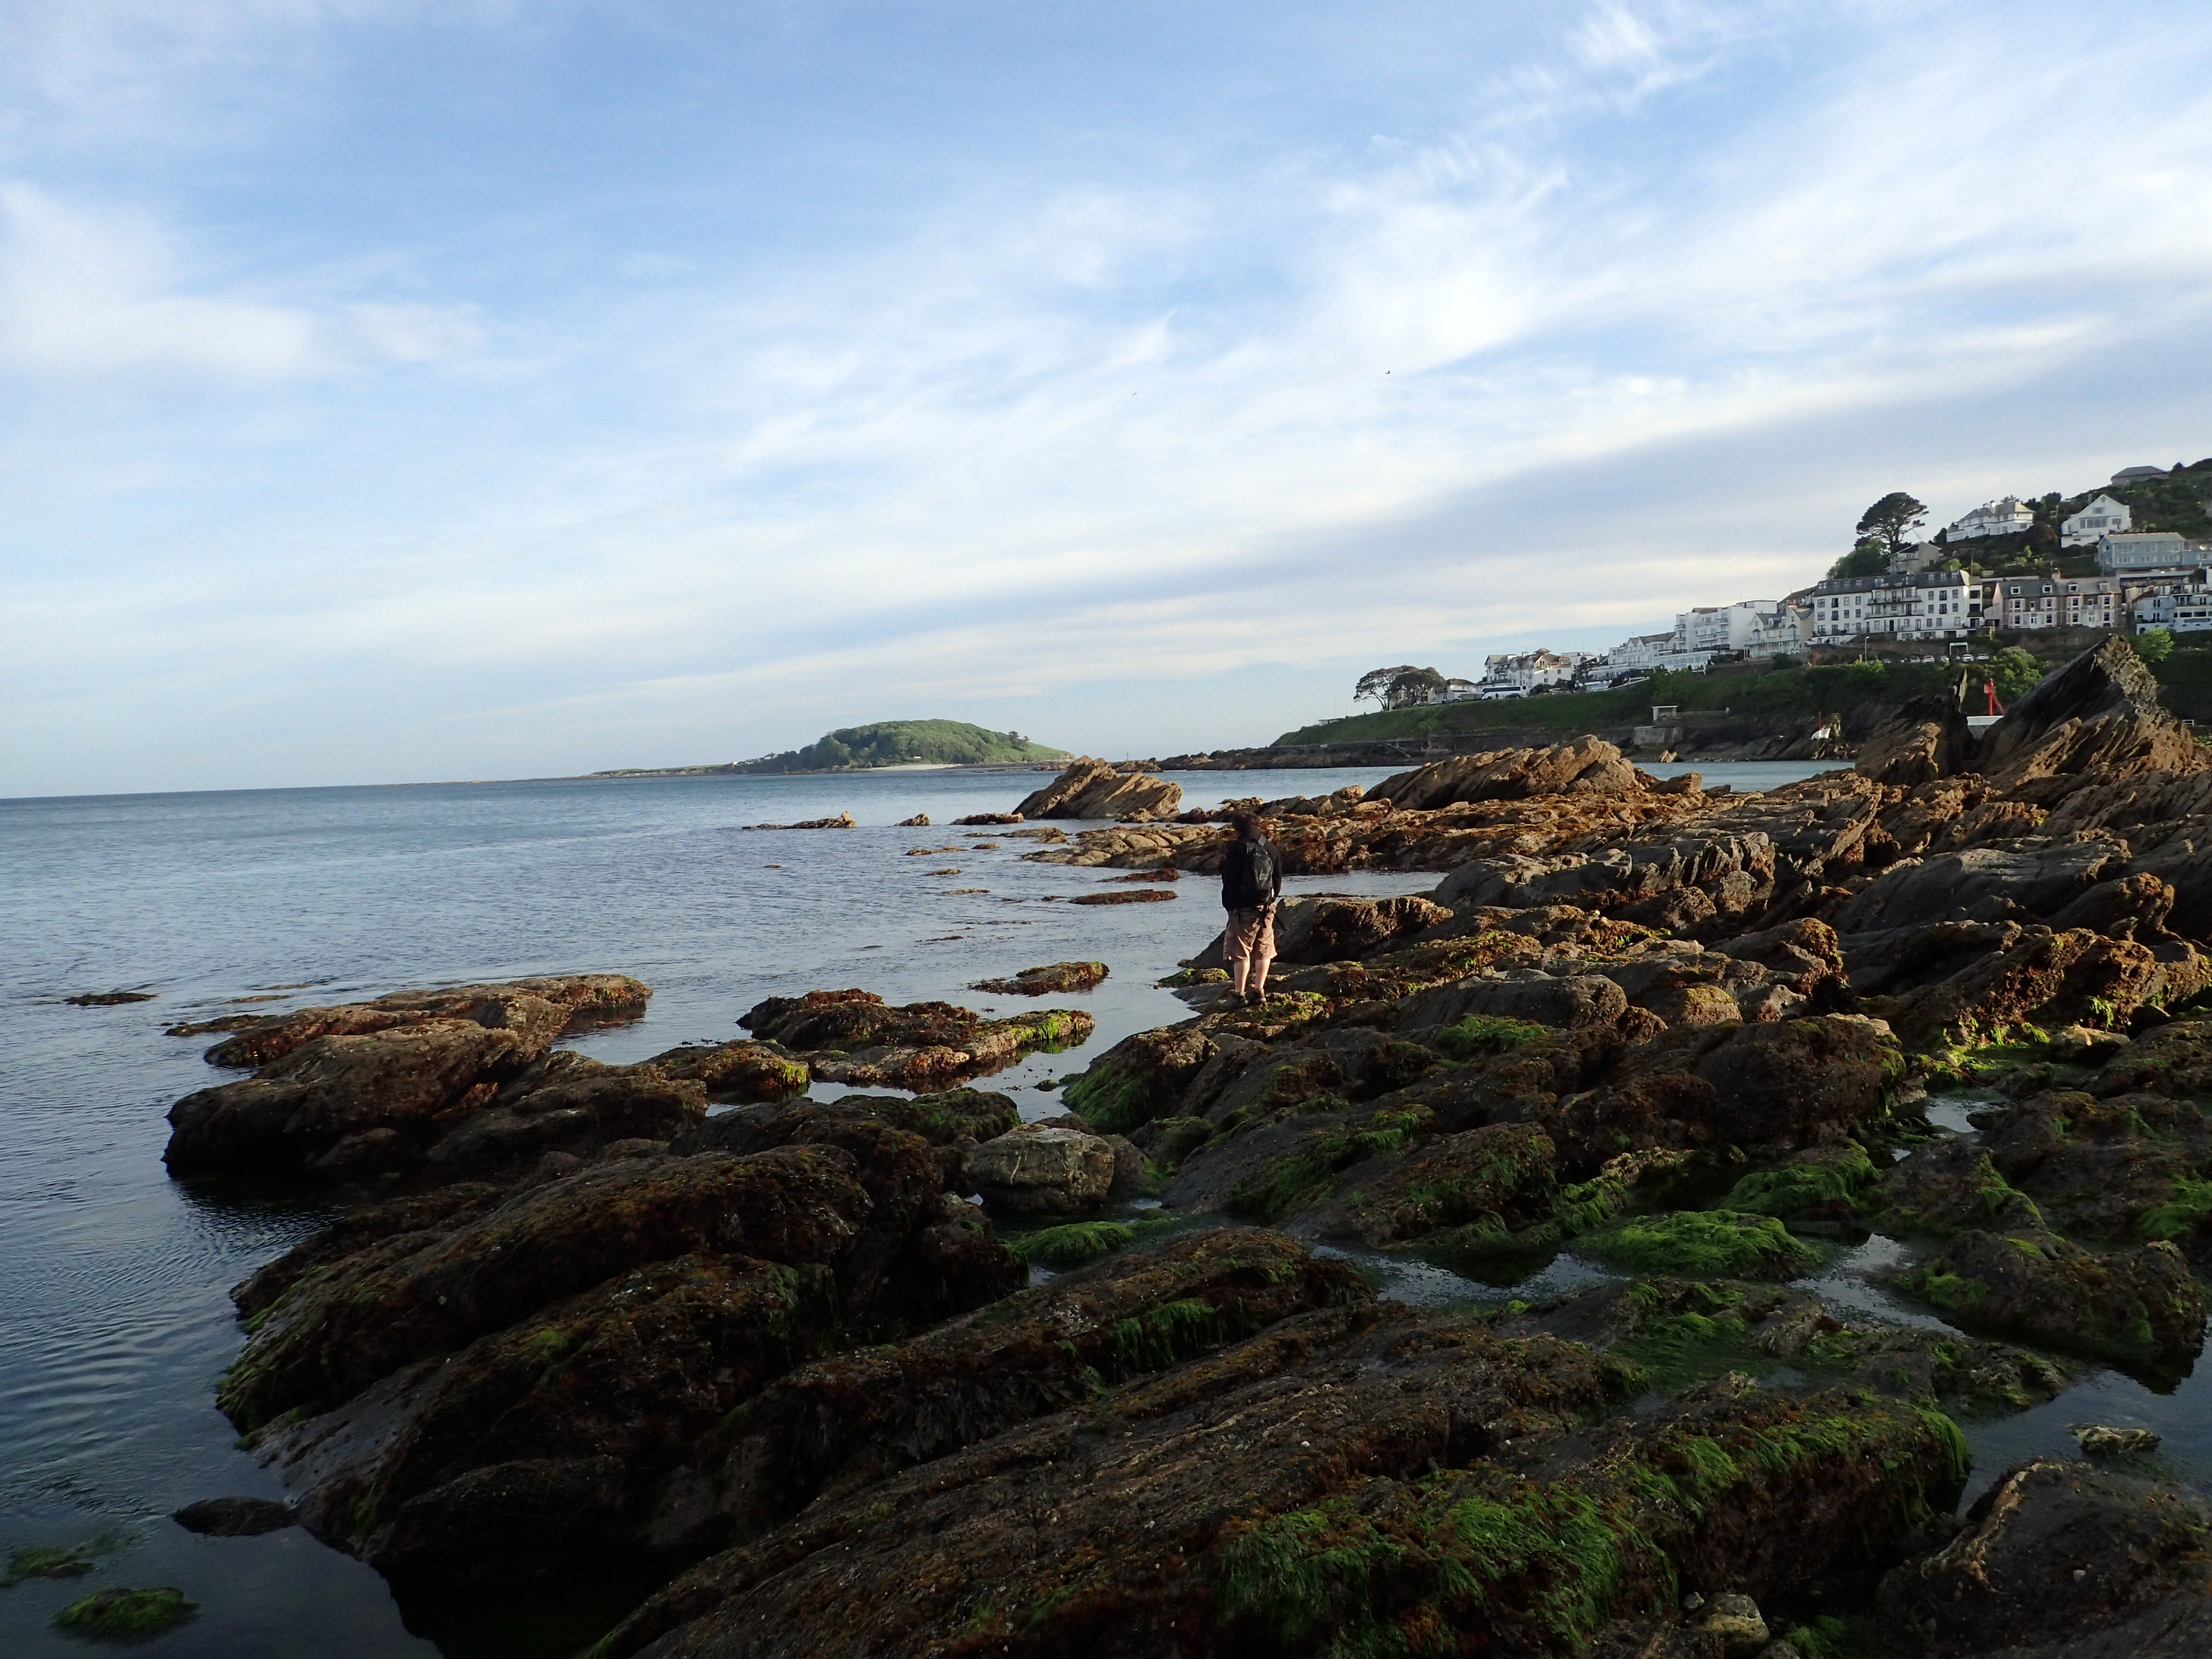 East Looe rocks in the evening